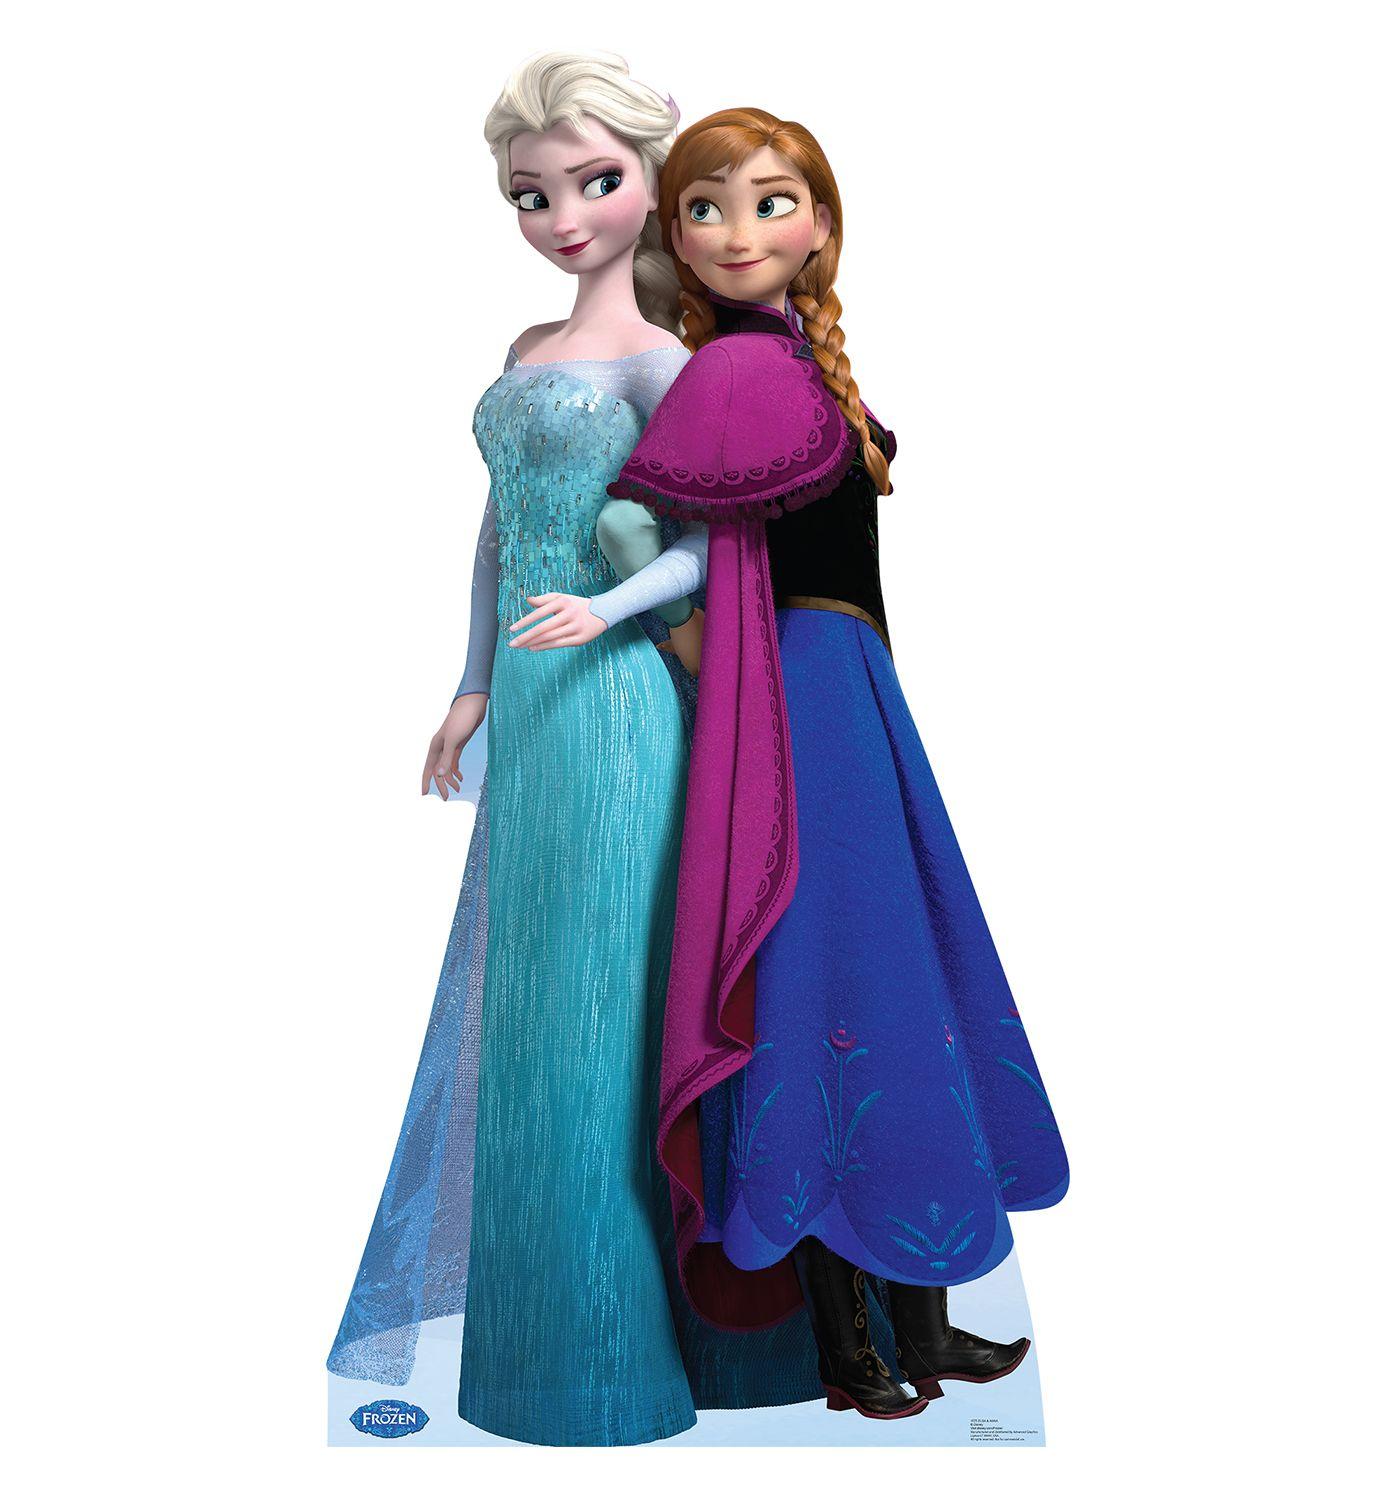 Elsa And Anna Disney S Frozen Cardboard Cutout 1575 Disney Frozen Party Elsa Frozen Elsa